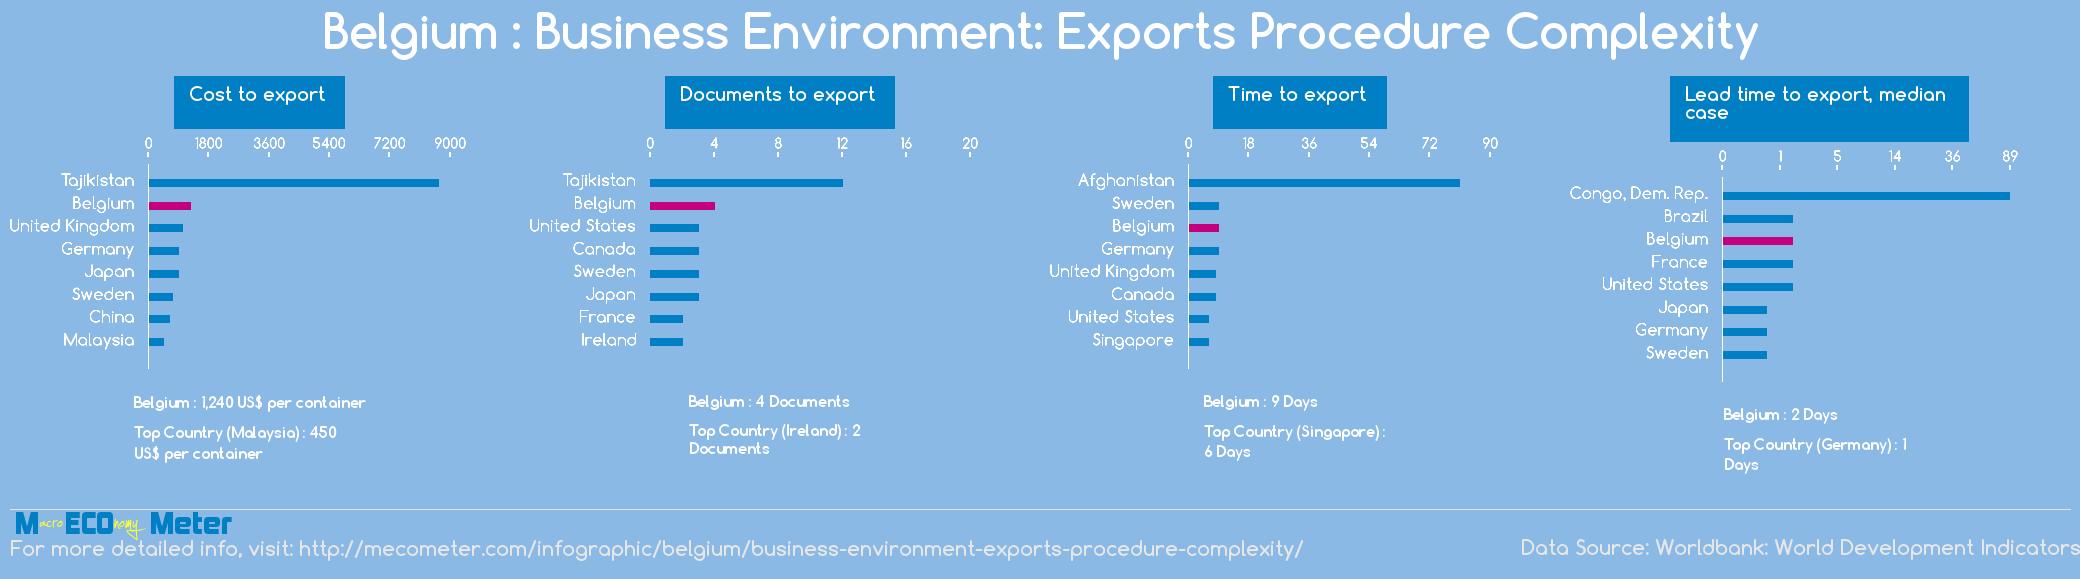 Belgium : Business Environment: Exports Procedure Complexity